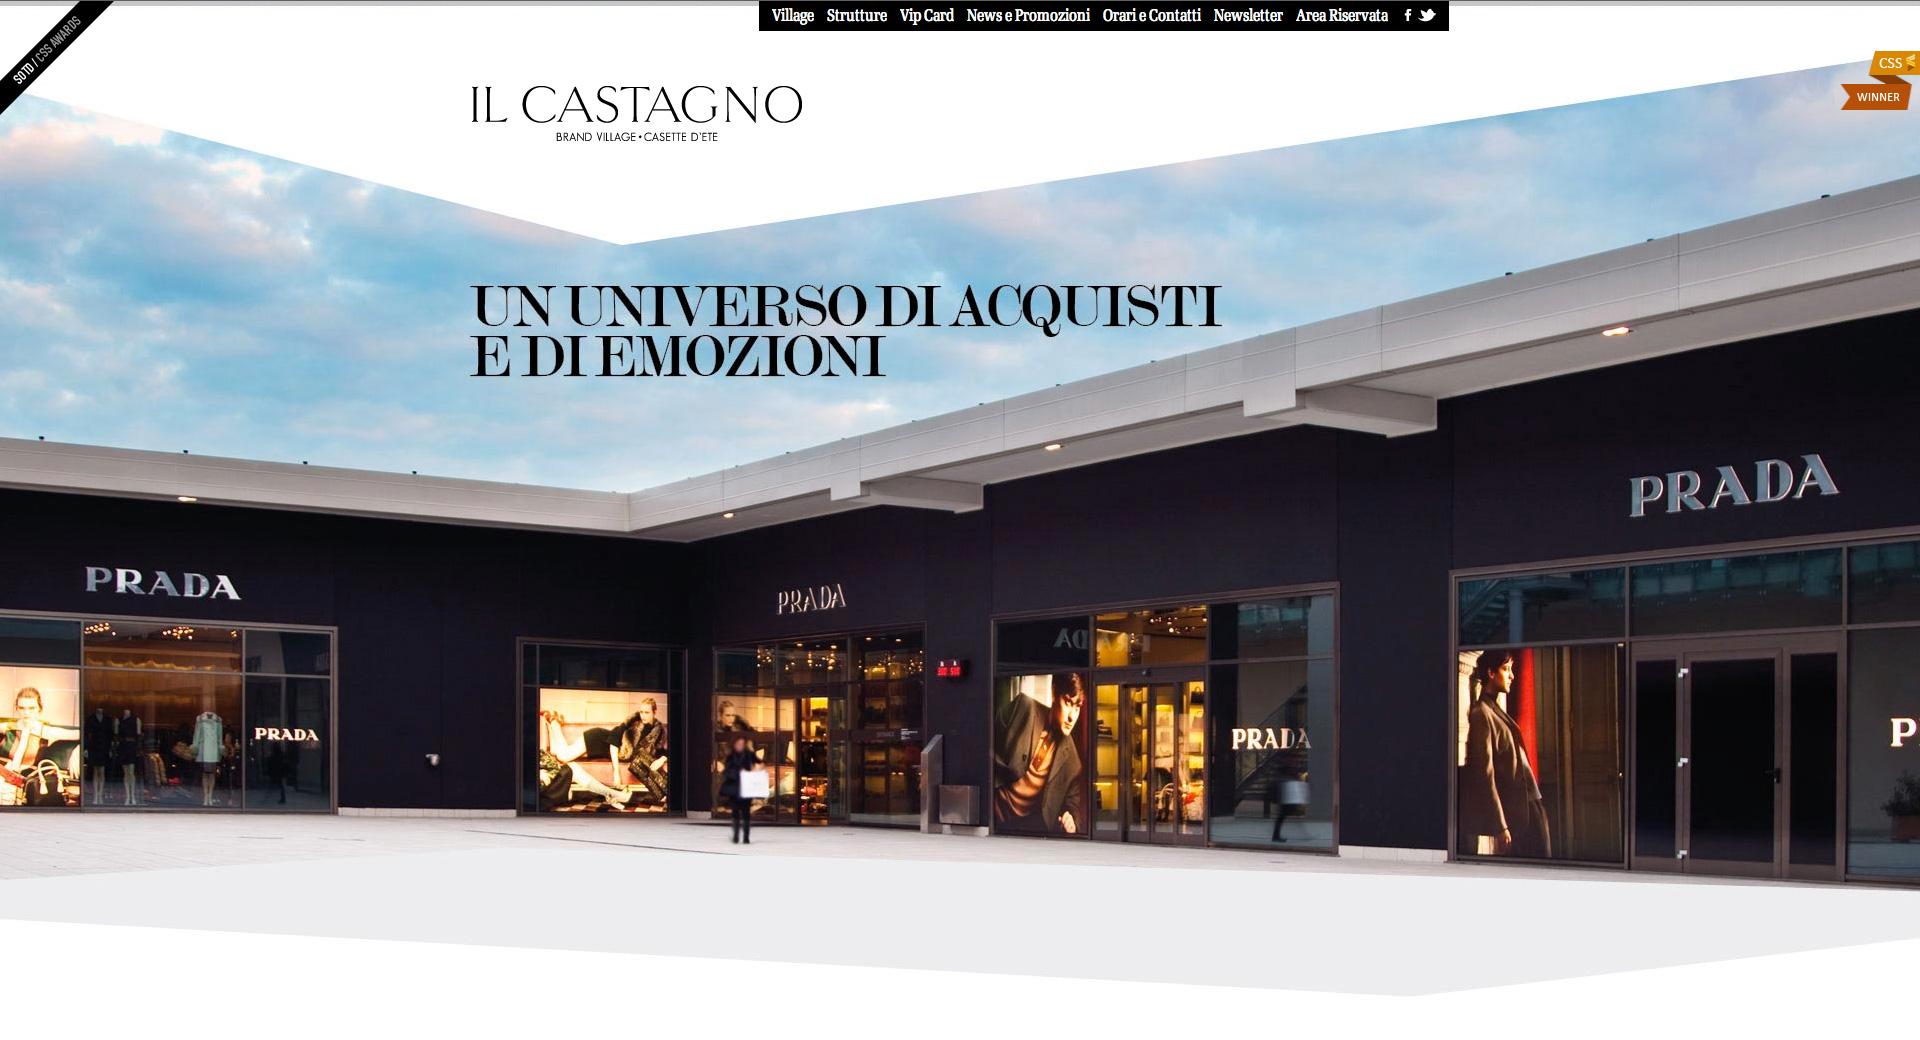 IL CASTAGNO Brand Village Website Screenshot